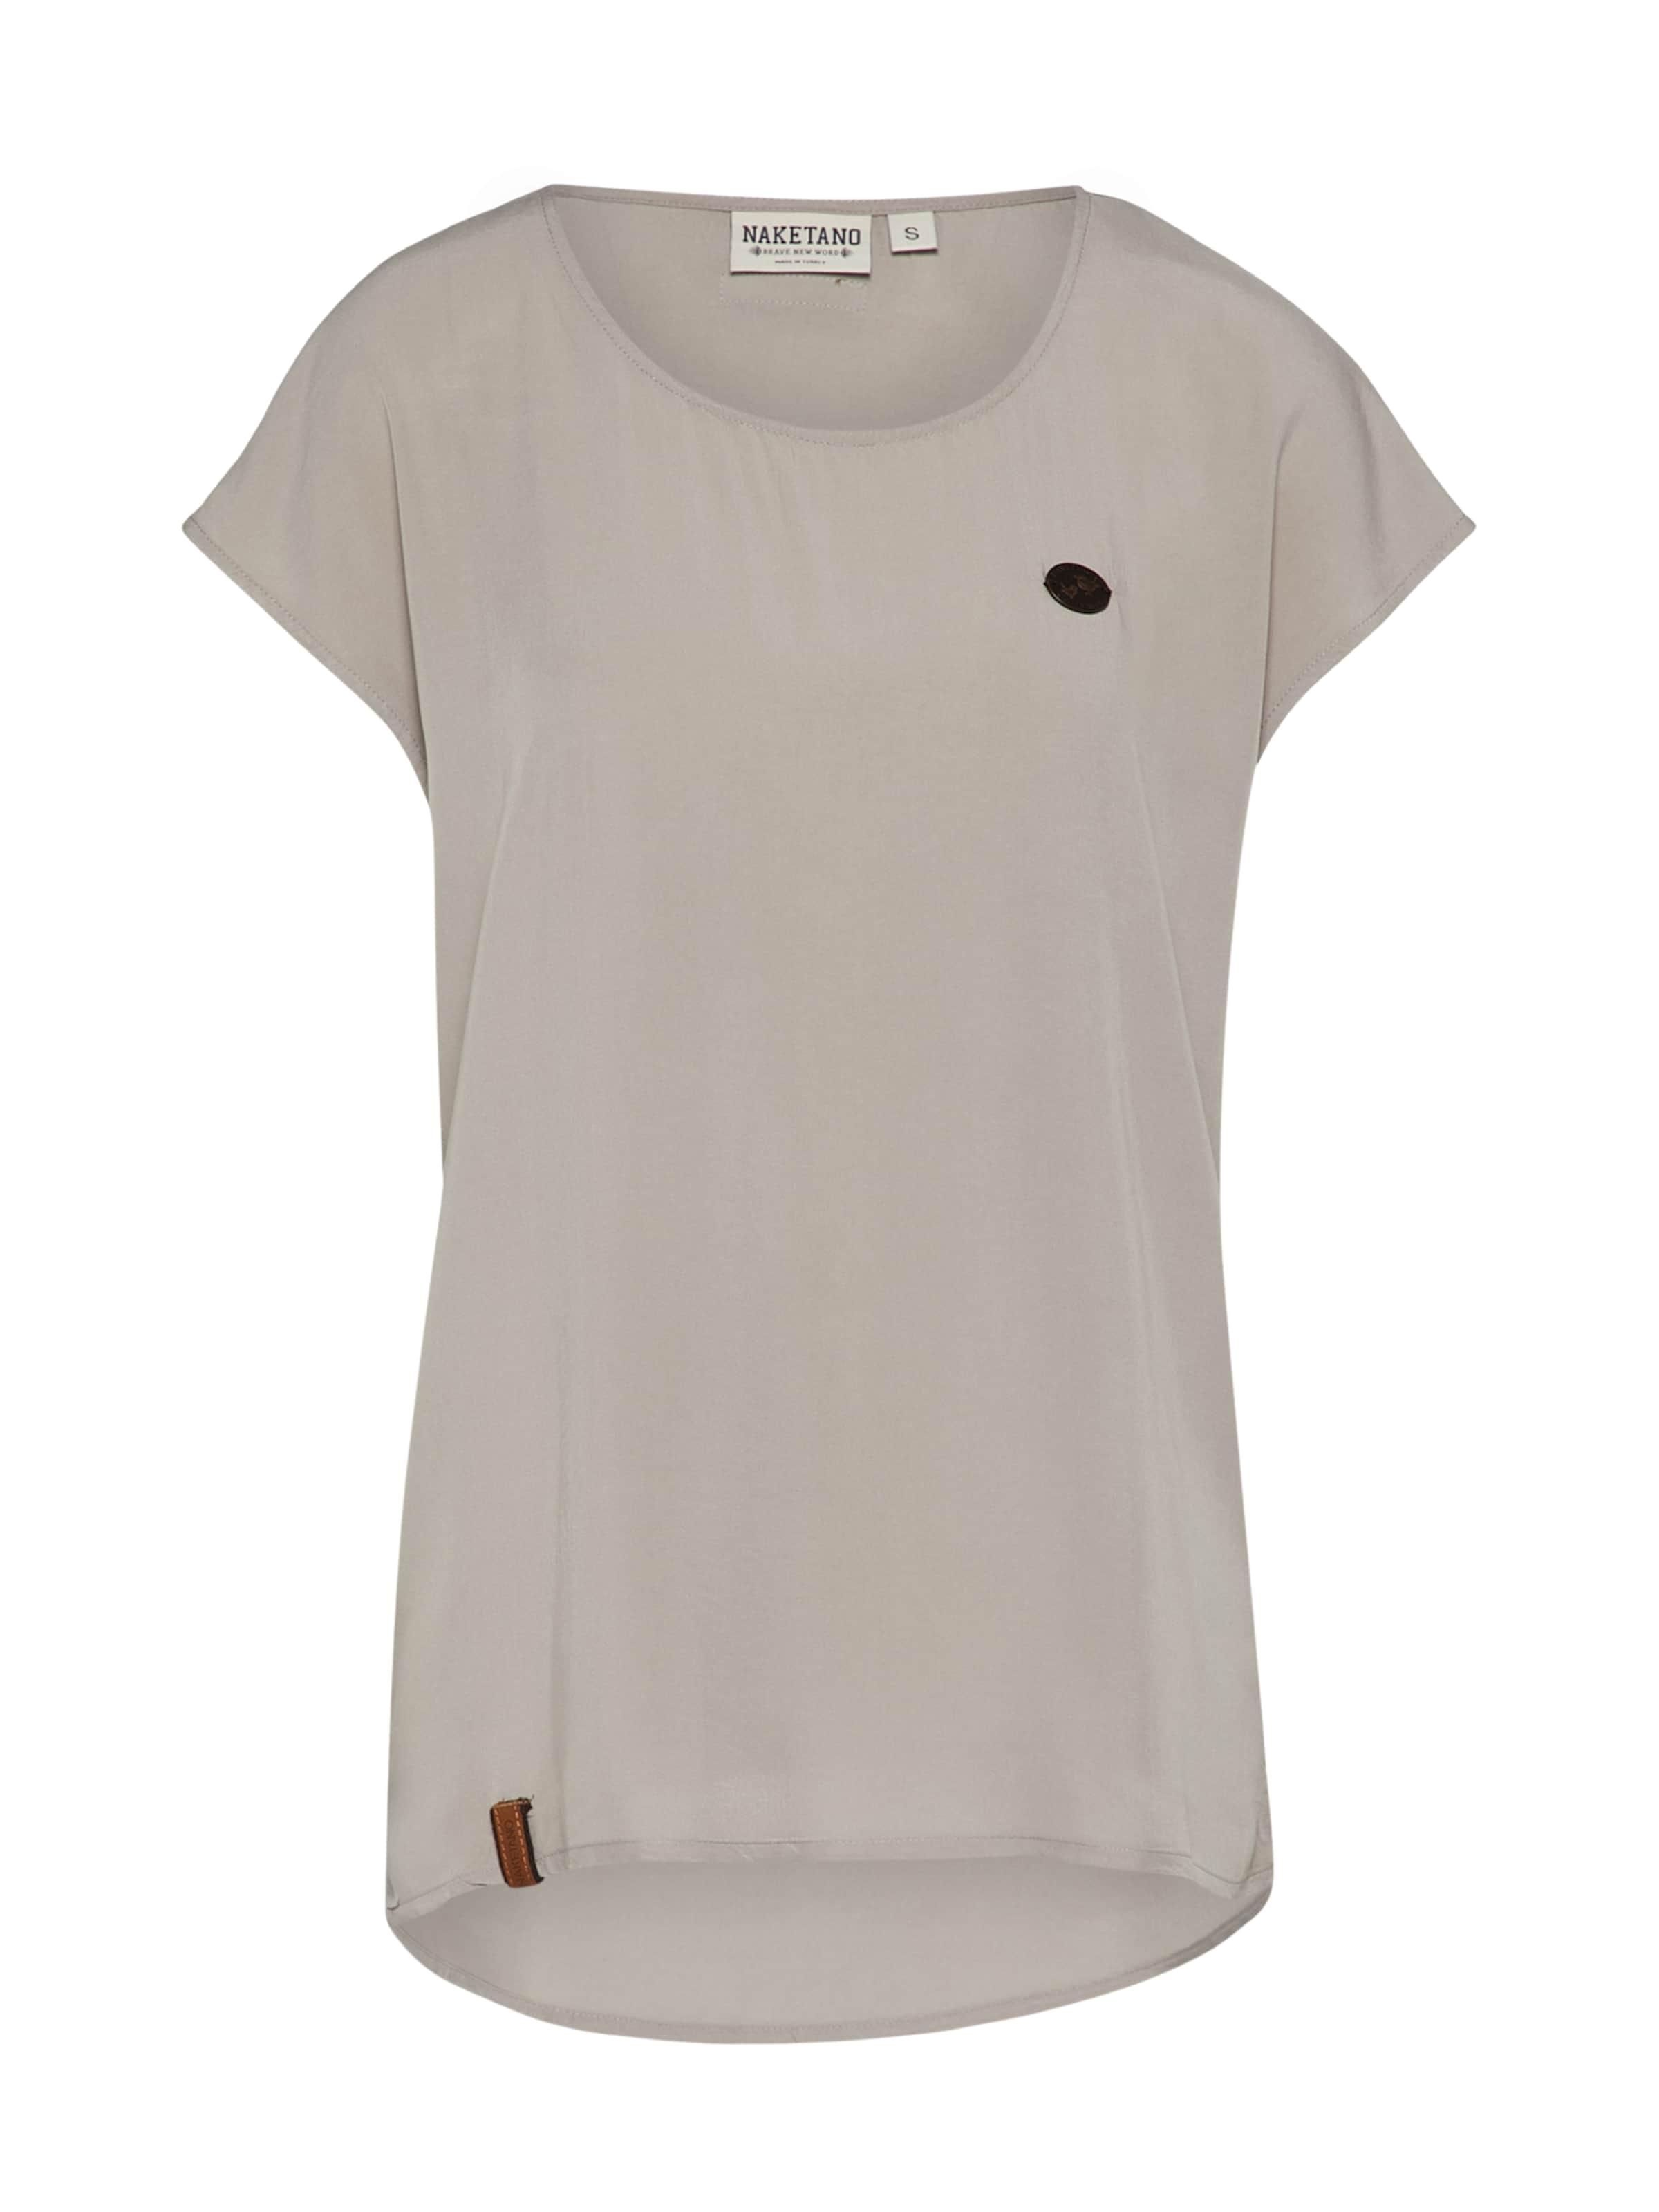 Naketano T shirt 'stanzovic' En Fumé Bleu QrtsxhCd